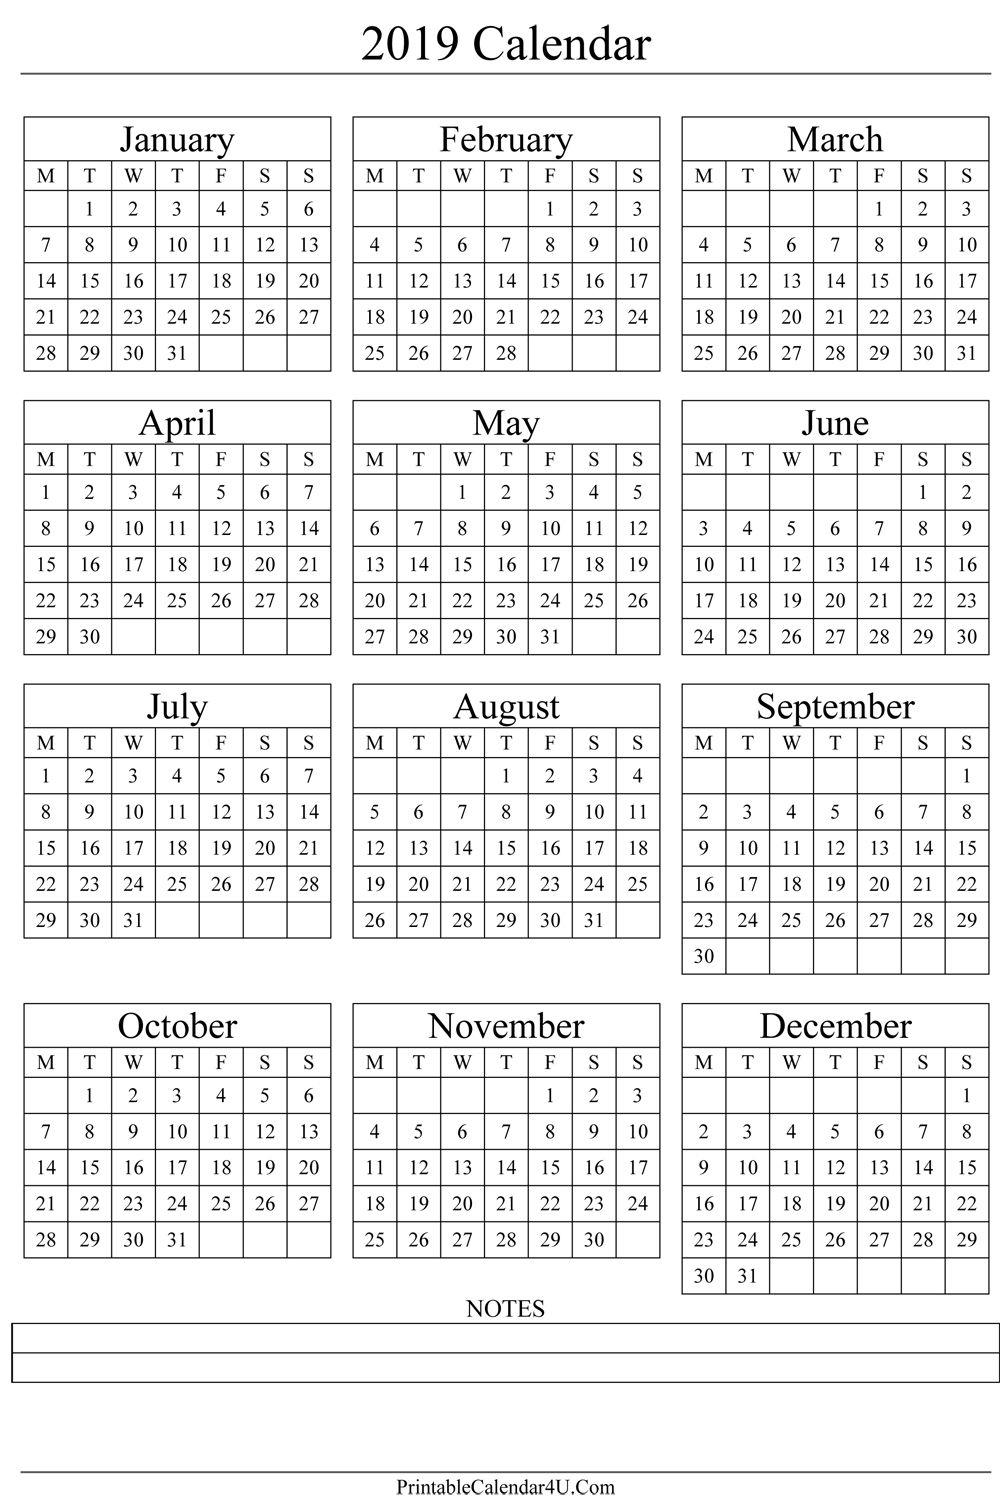 Annual Calendar 2019 Portrait Printable Calendar 2017 | Gift Ideas intended for 1 Week Vacation Calendar Printable